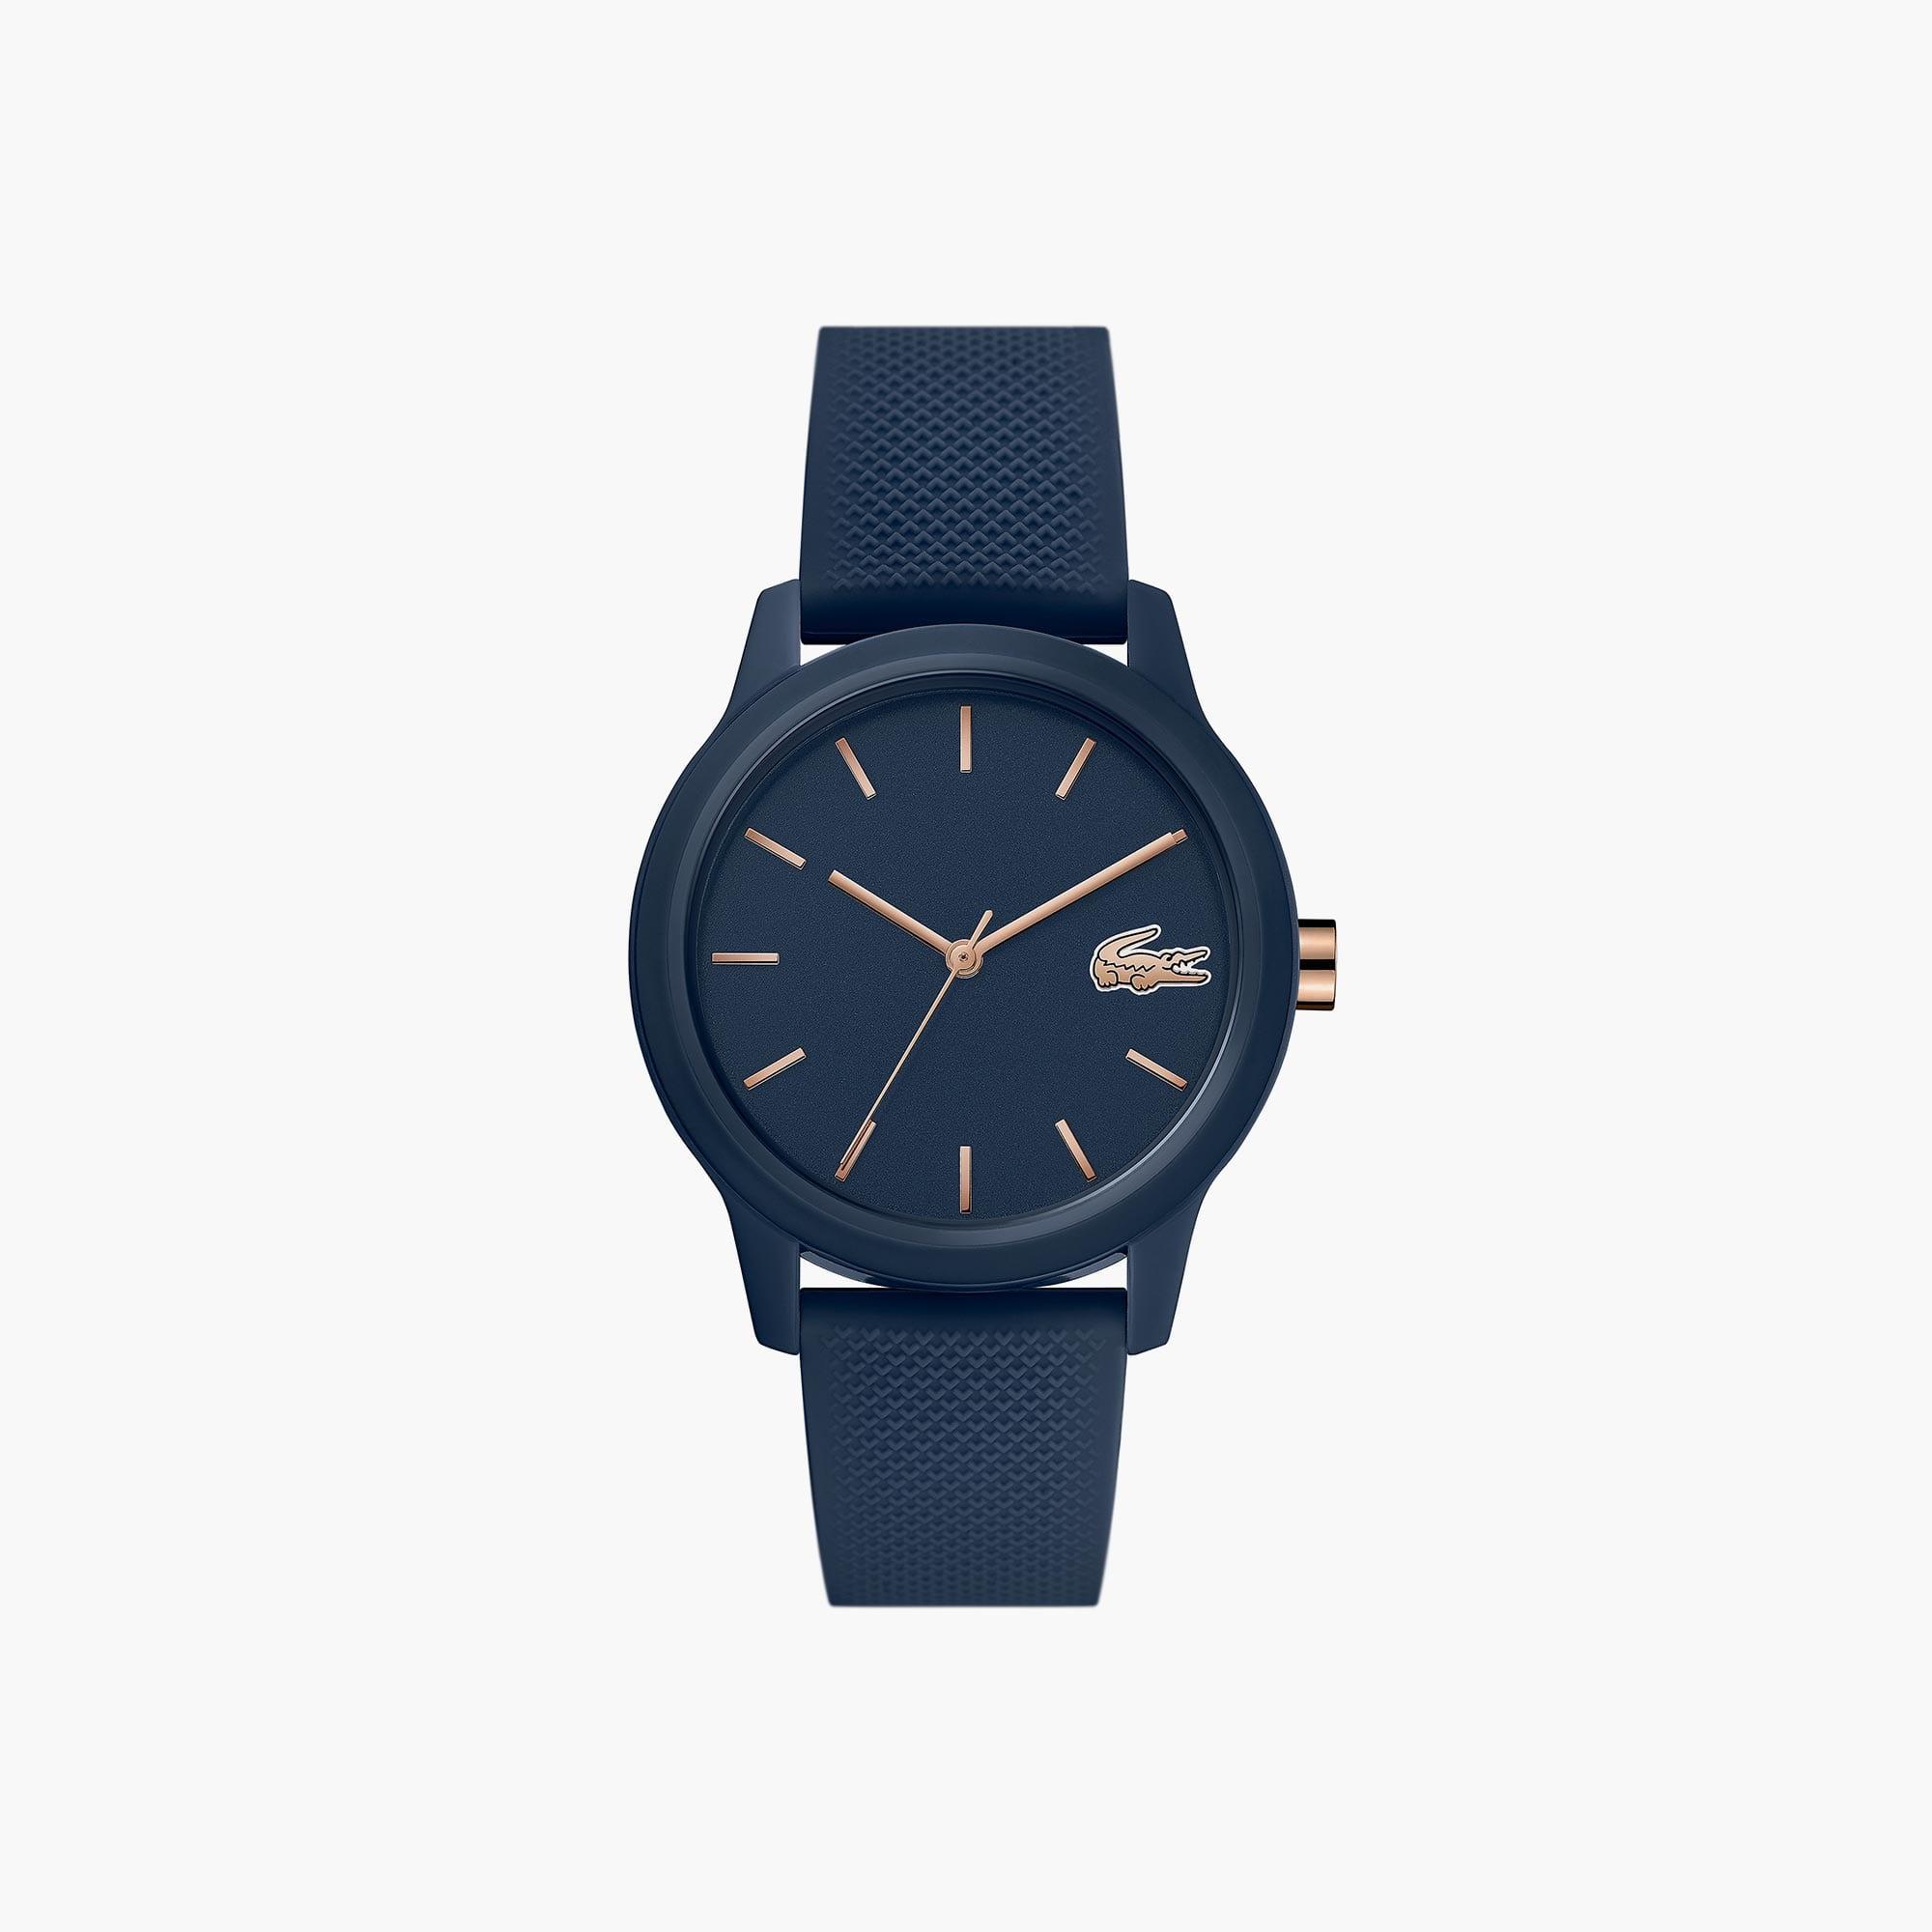 22cdef4d083 Horloge Lacoste.12.12 dames met marineblauwe siliconenband met petit piqué